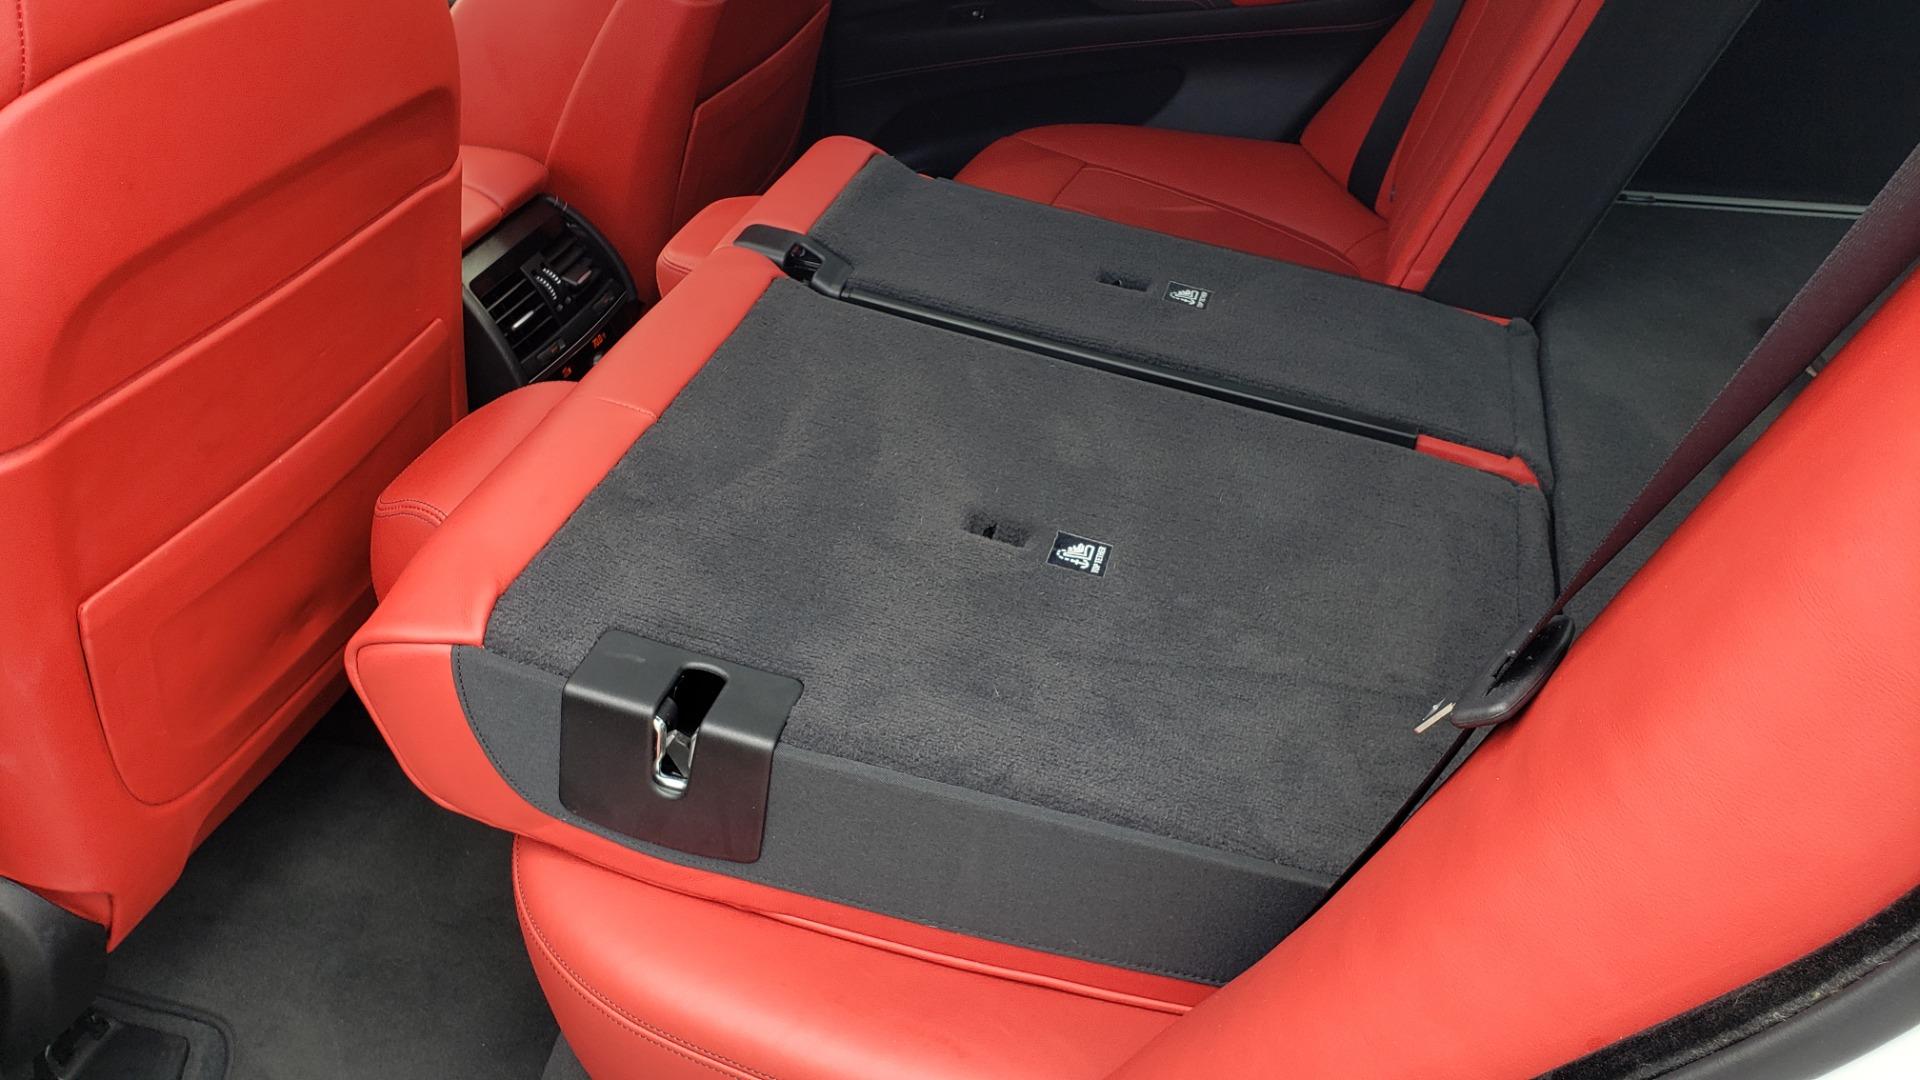 Used 2017 BMW X5 M EXECUTIVE PKG / NAV / DRVR ASST / BSM / HUD / HTD STS / WIFI for sale Sold at Formula Imports in Charlotte NC 28227 69